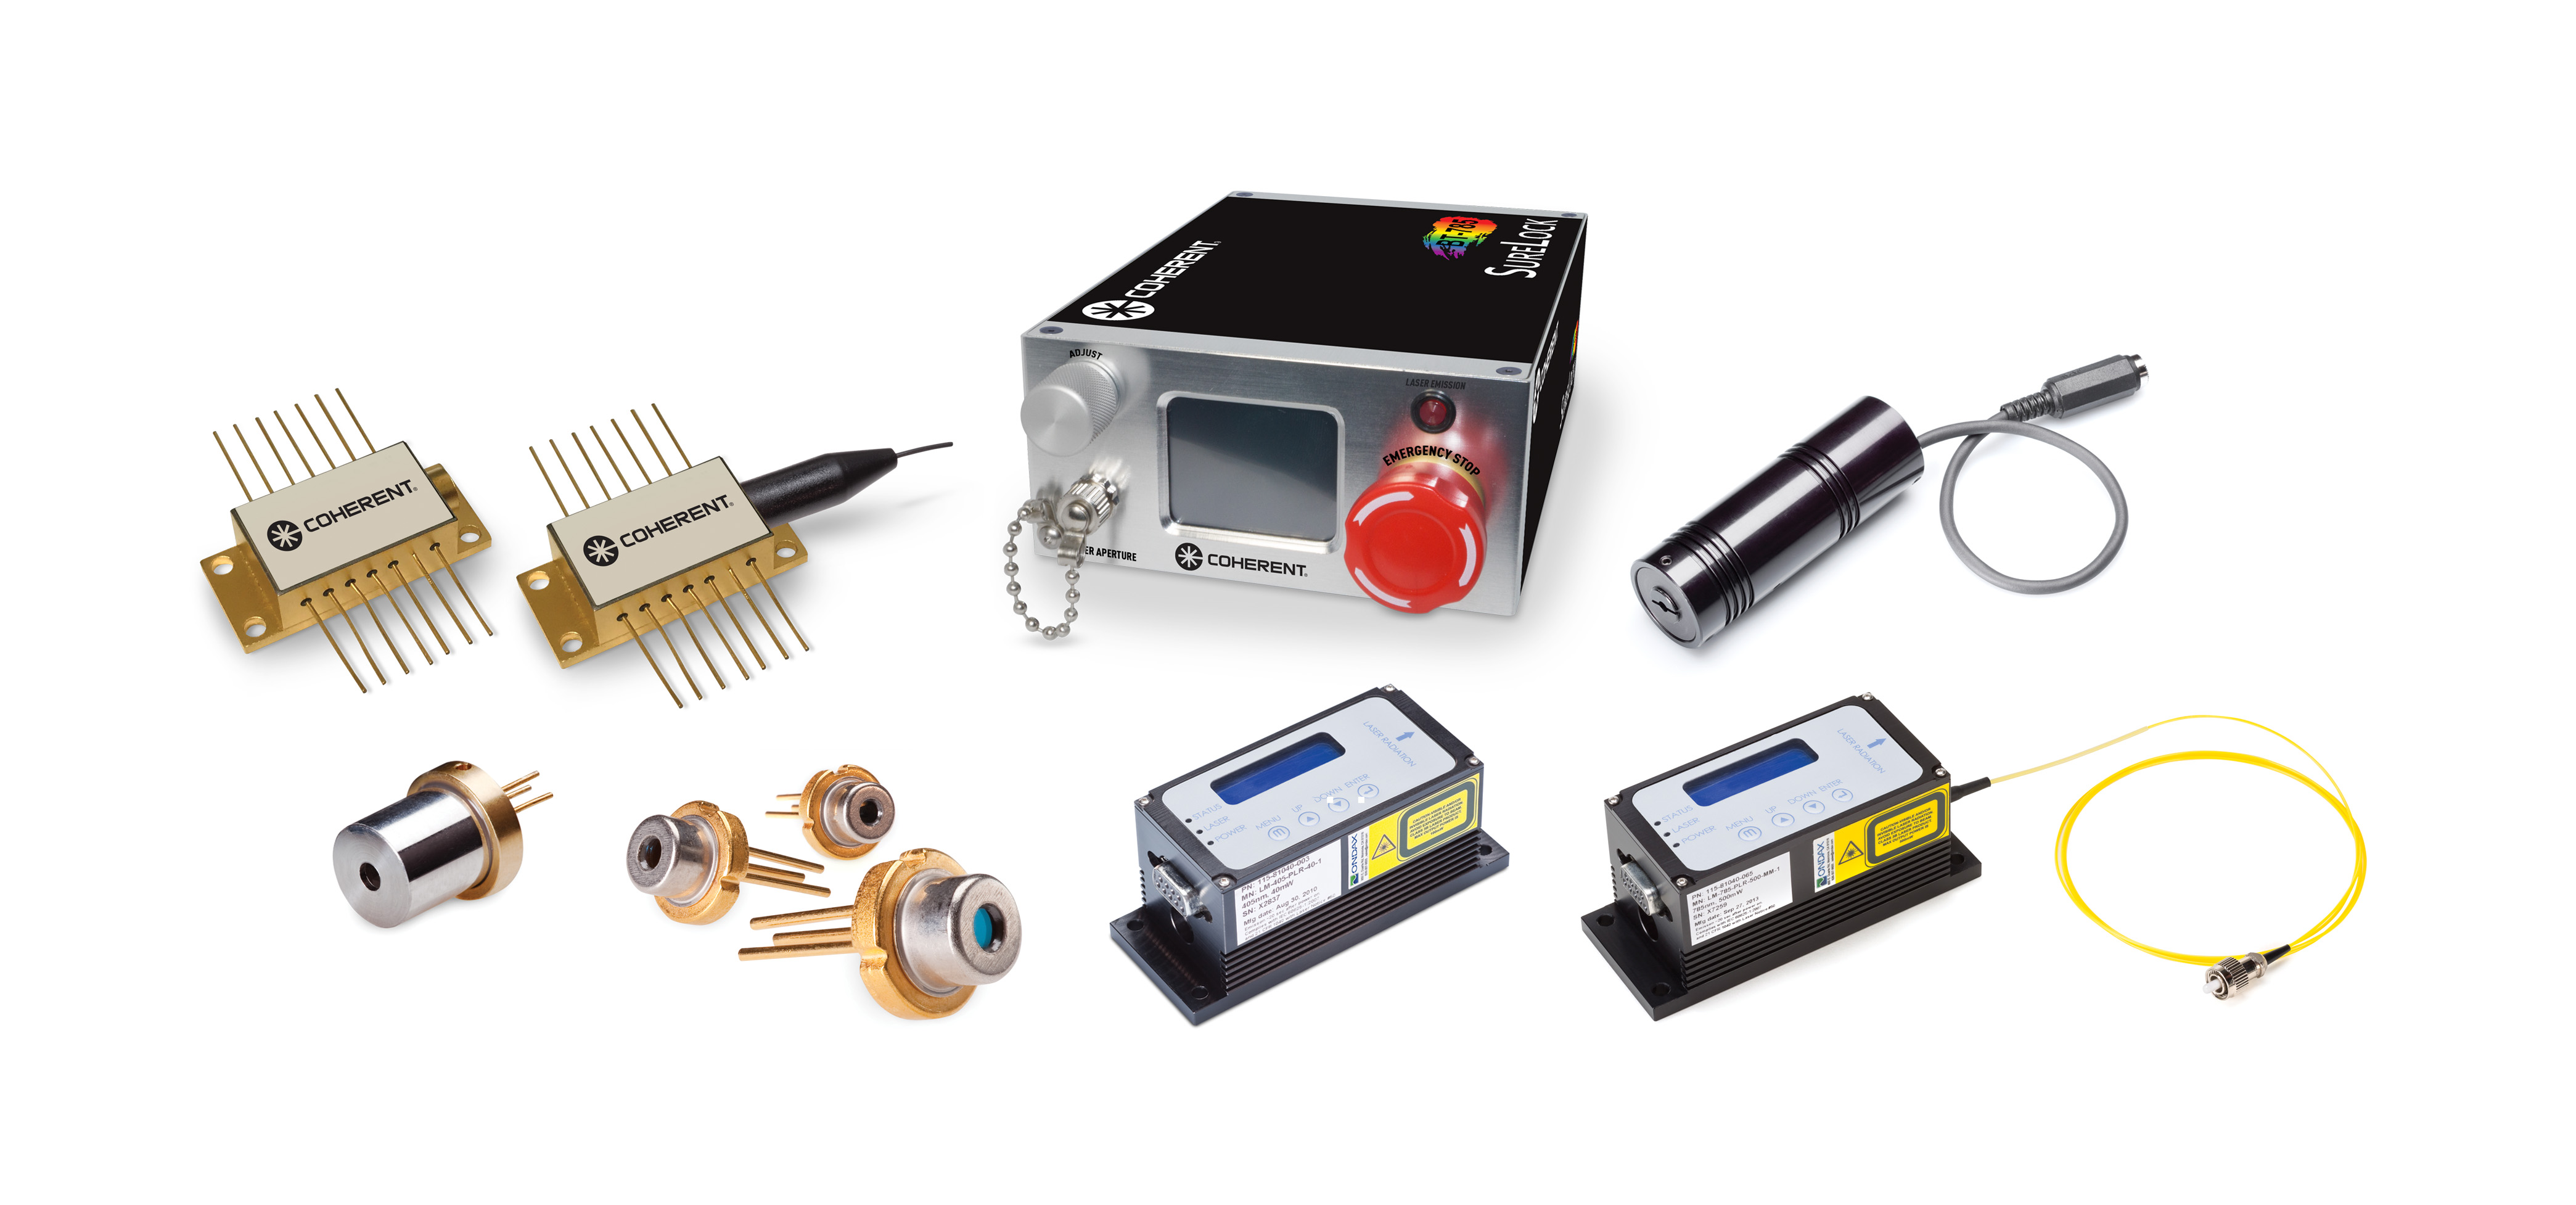 SureLock Wavelength Stabilized Laser Diode Modules